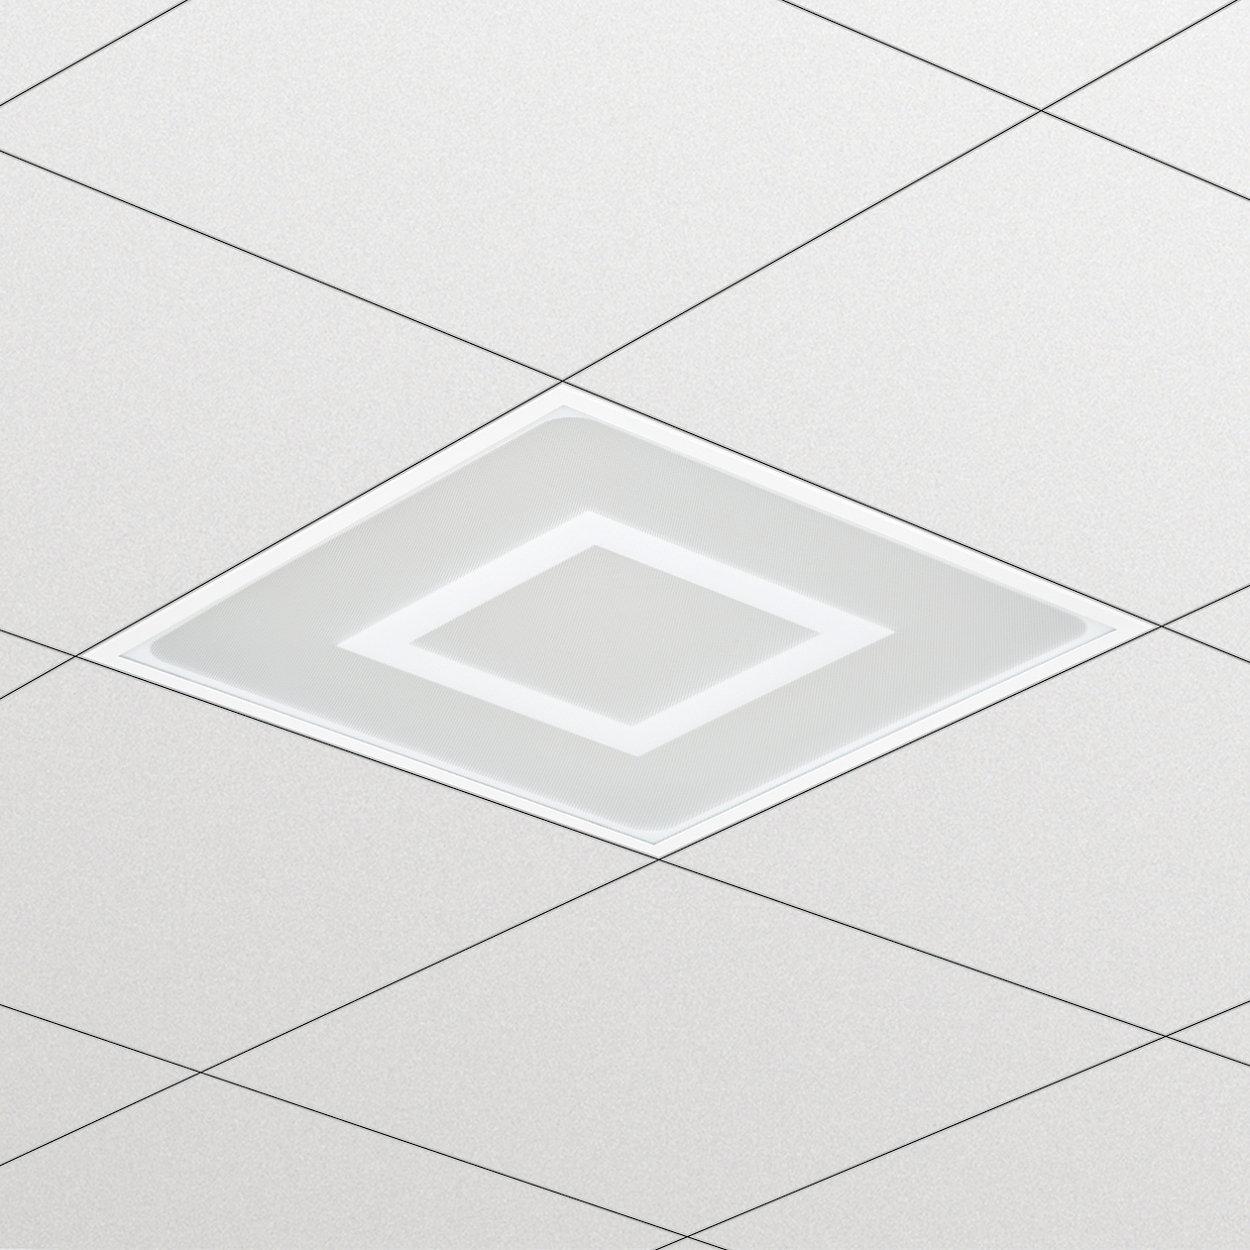 SmartBalance a incasso - Quando le performance incontrano il design elegante